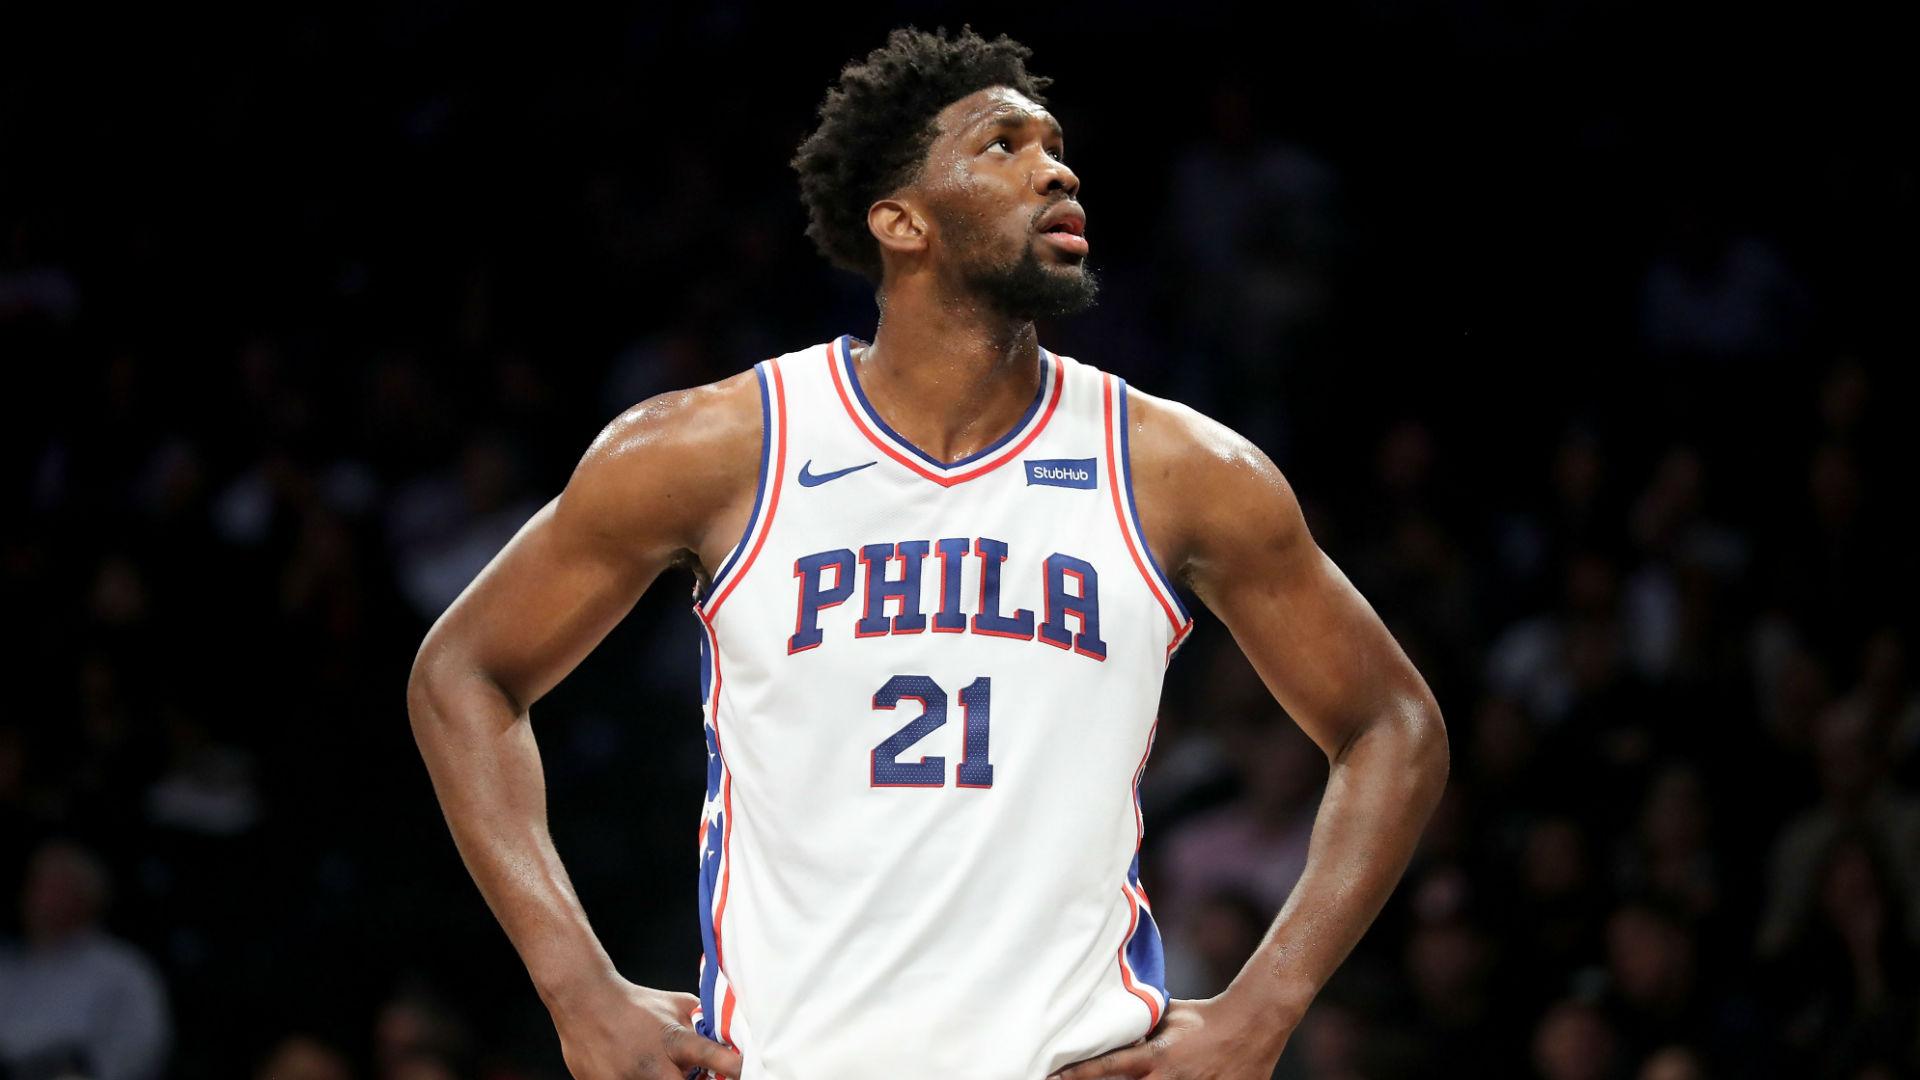 Joel Embiid injury update: 76ers big man (knee) doubtful for Game 4 vs. Nets